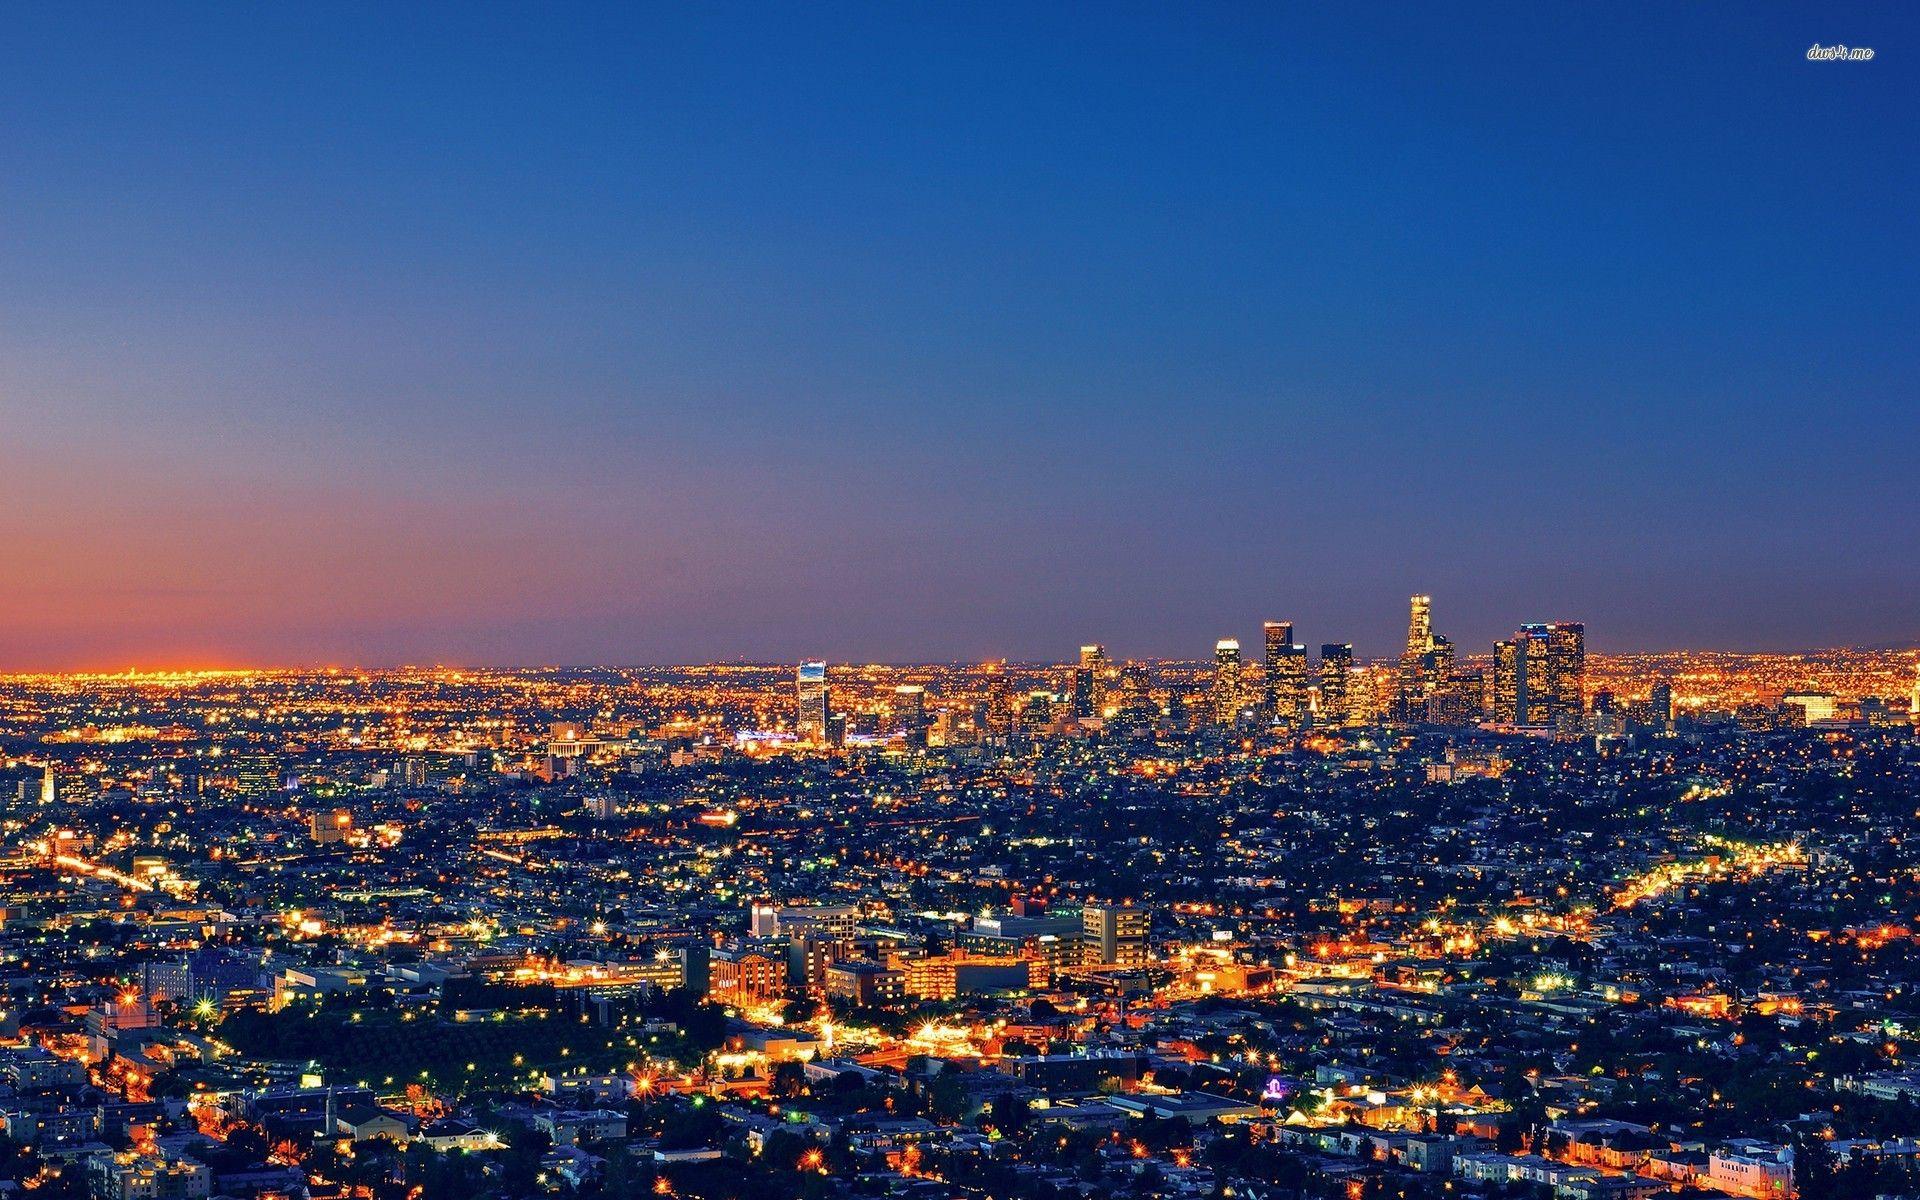 Los Angeles Free Wallpaper Wallpapersafari Los Angeles Wallpaper Los Angeles Pictures Los Angeles At Night